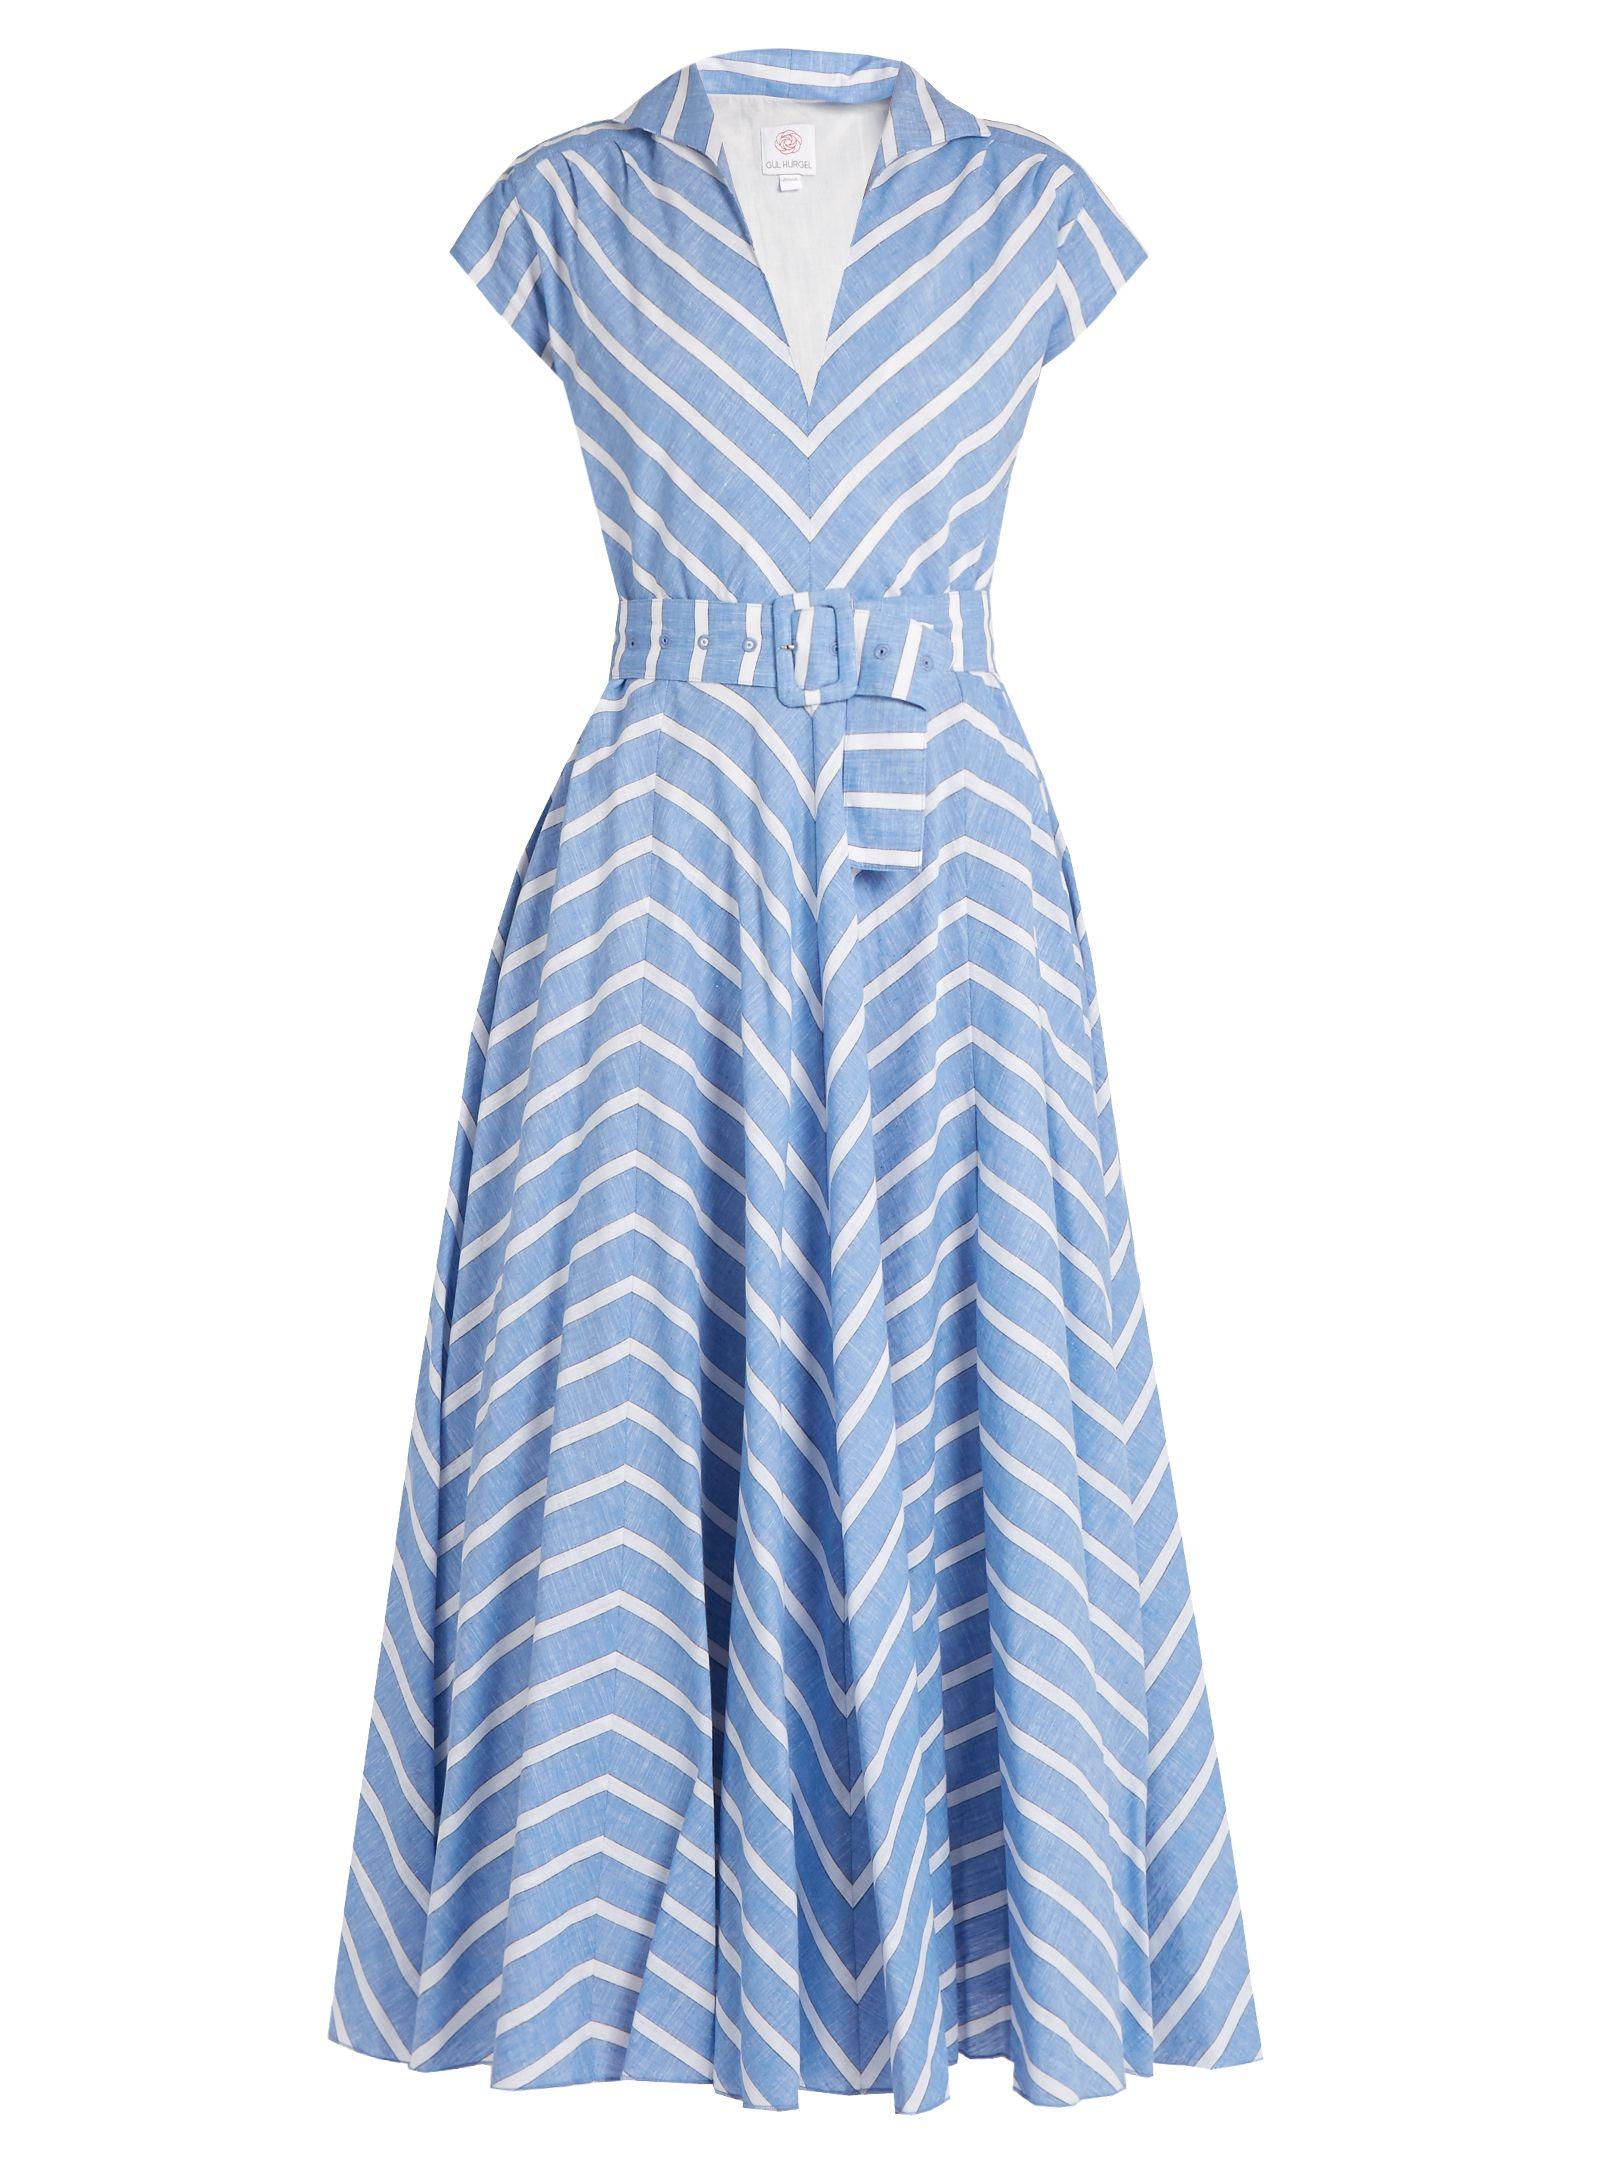 Gül Hürgel Striped cotton and linen-blend dress an homage to the endless  sunshine of